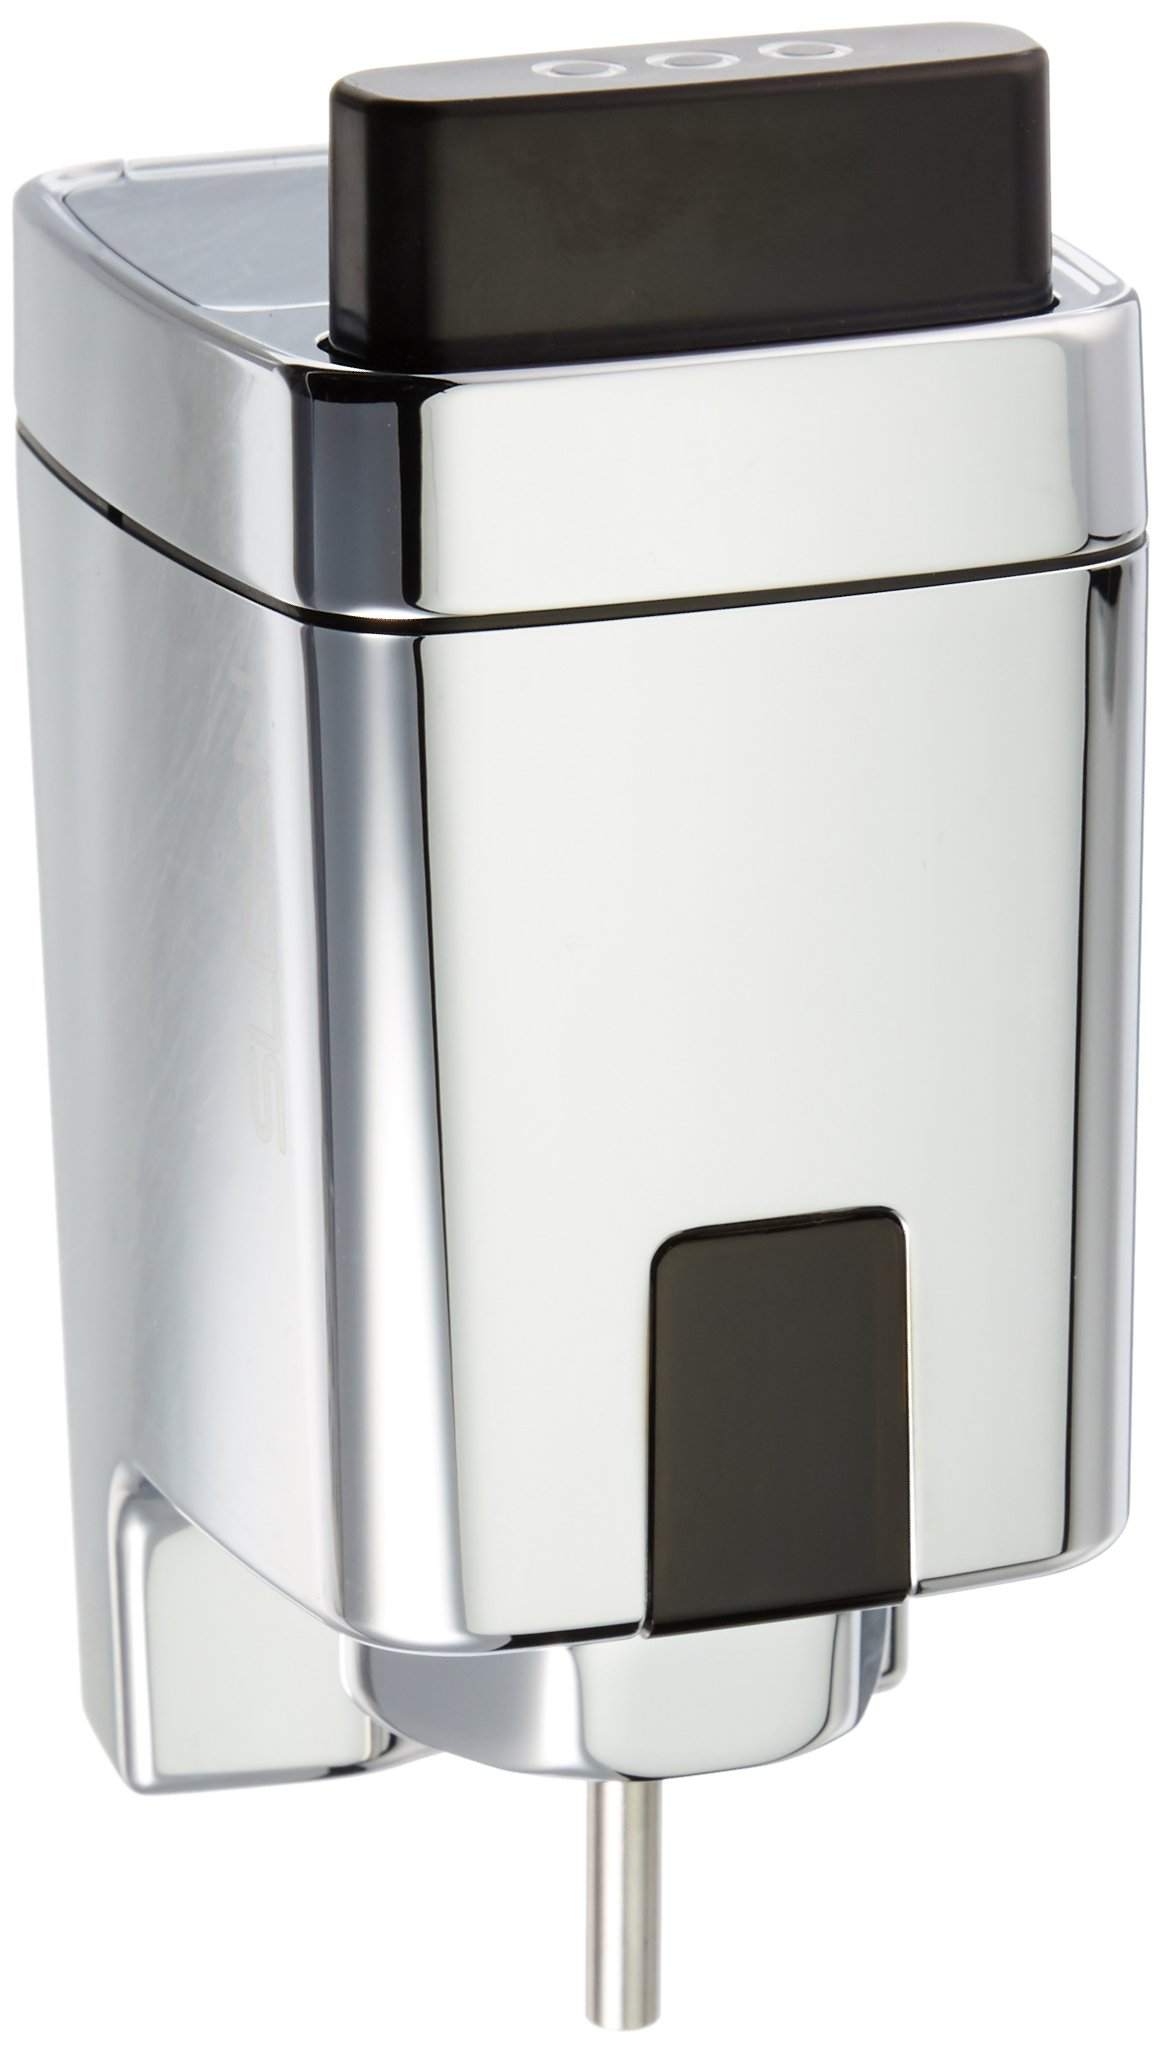 Sloan Valve EBV-500-A Single Flush Side-Mount Retrofit Kit for Water Closets and Urinals